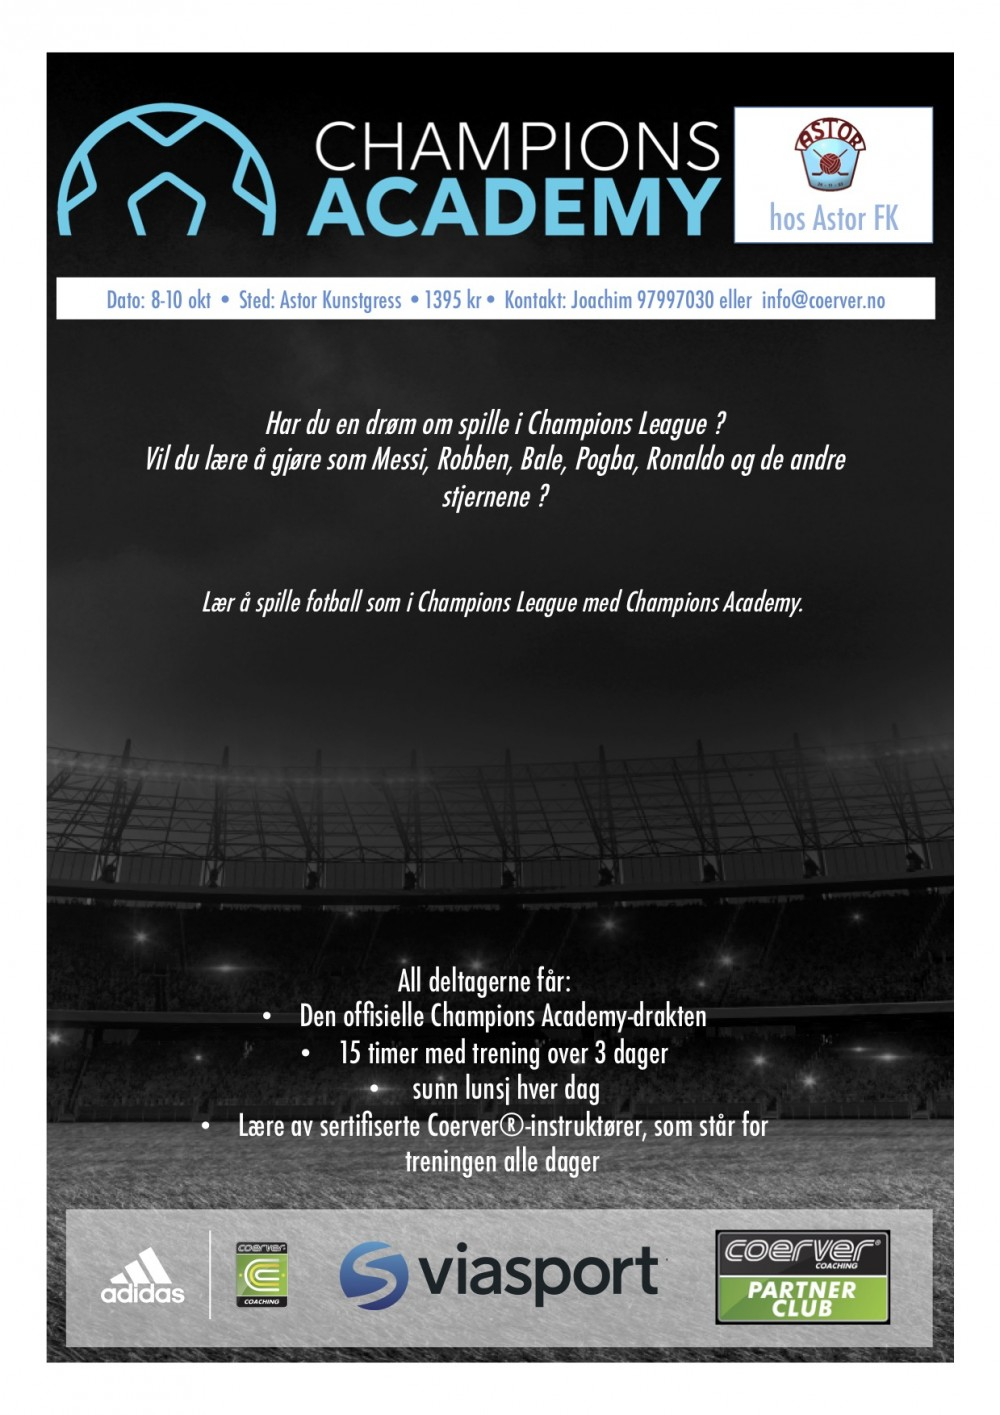 Champions Academy hos Astor FK uke 41